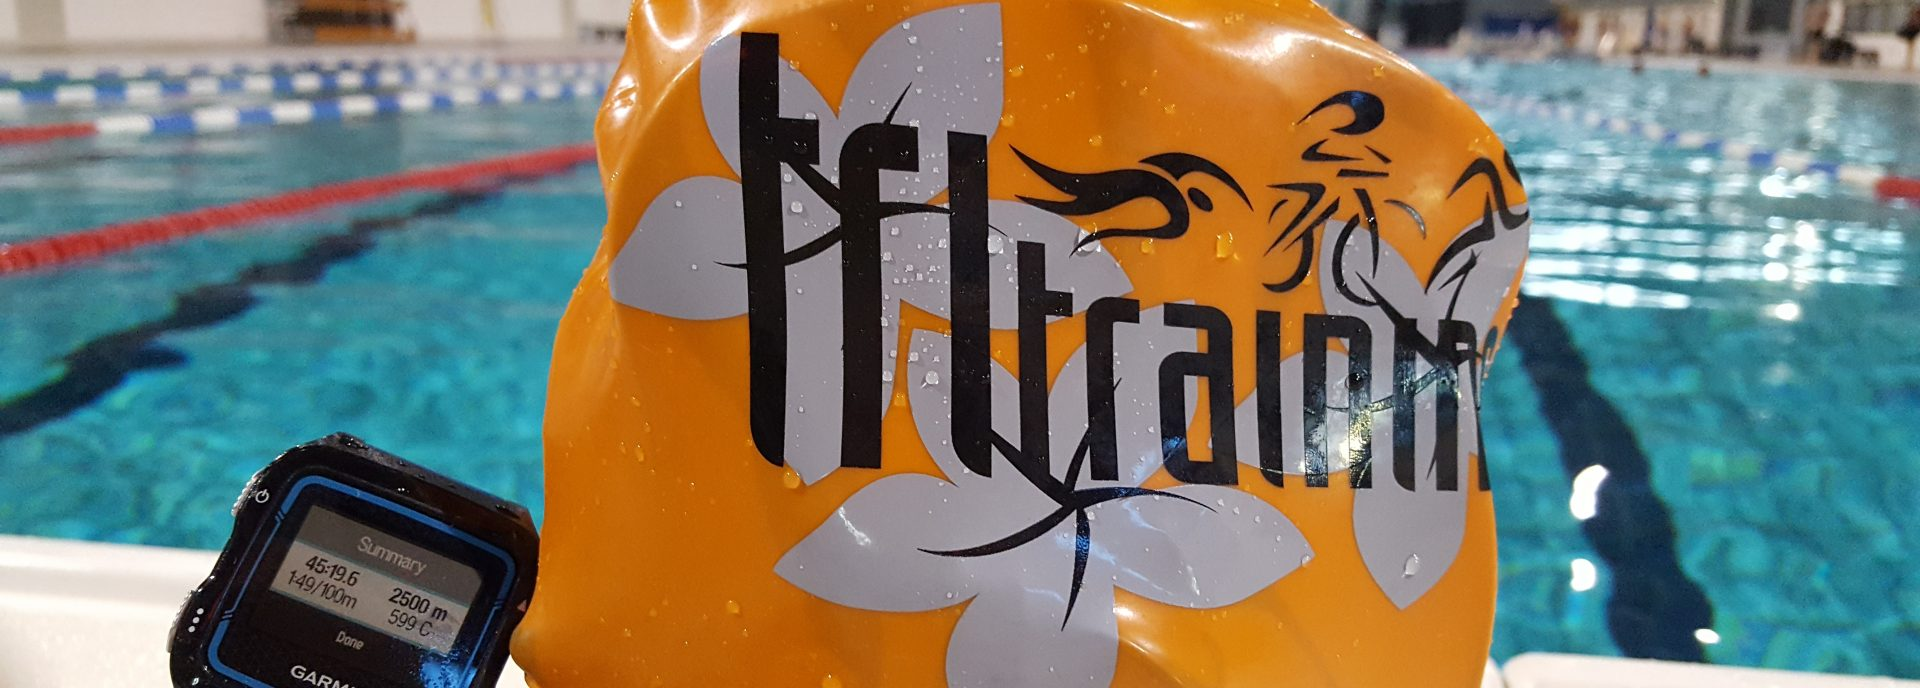 Tritraining